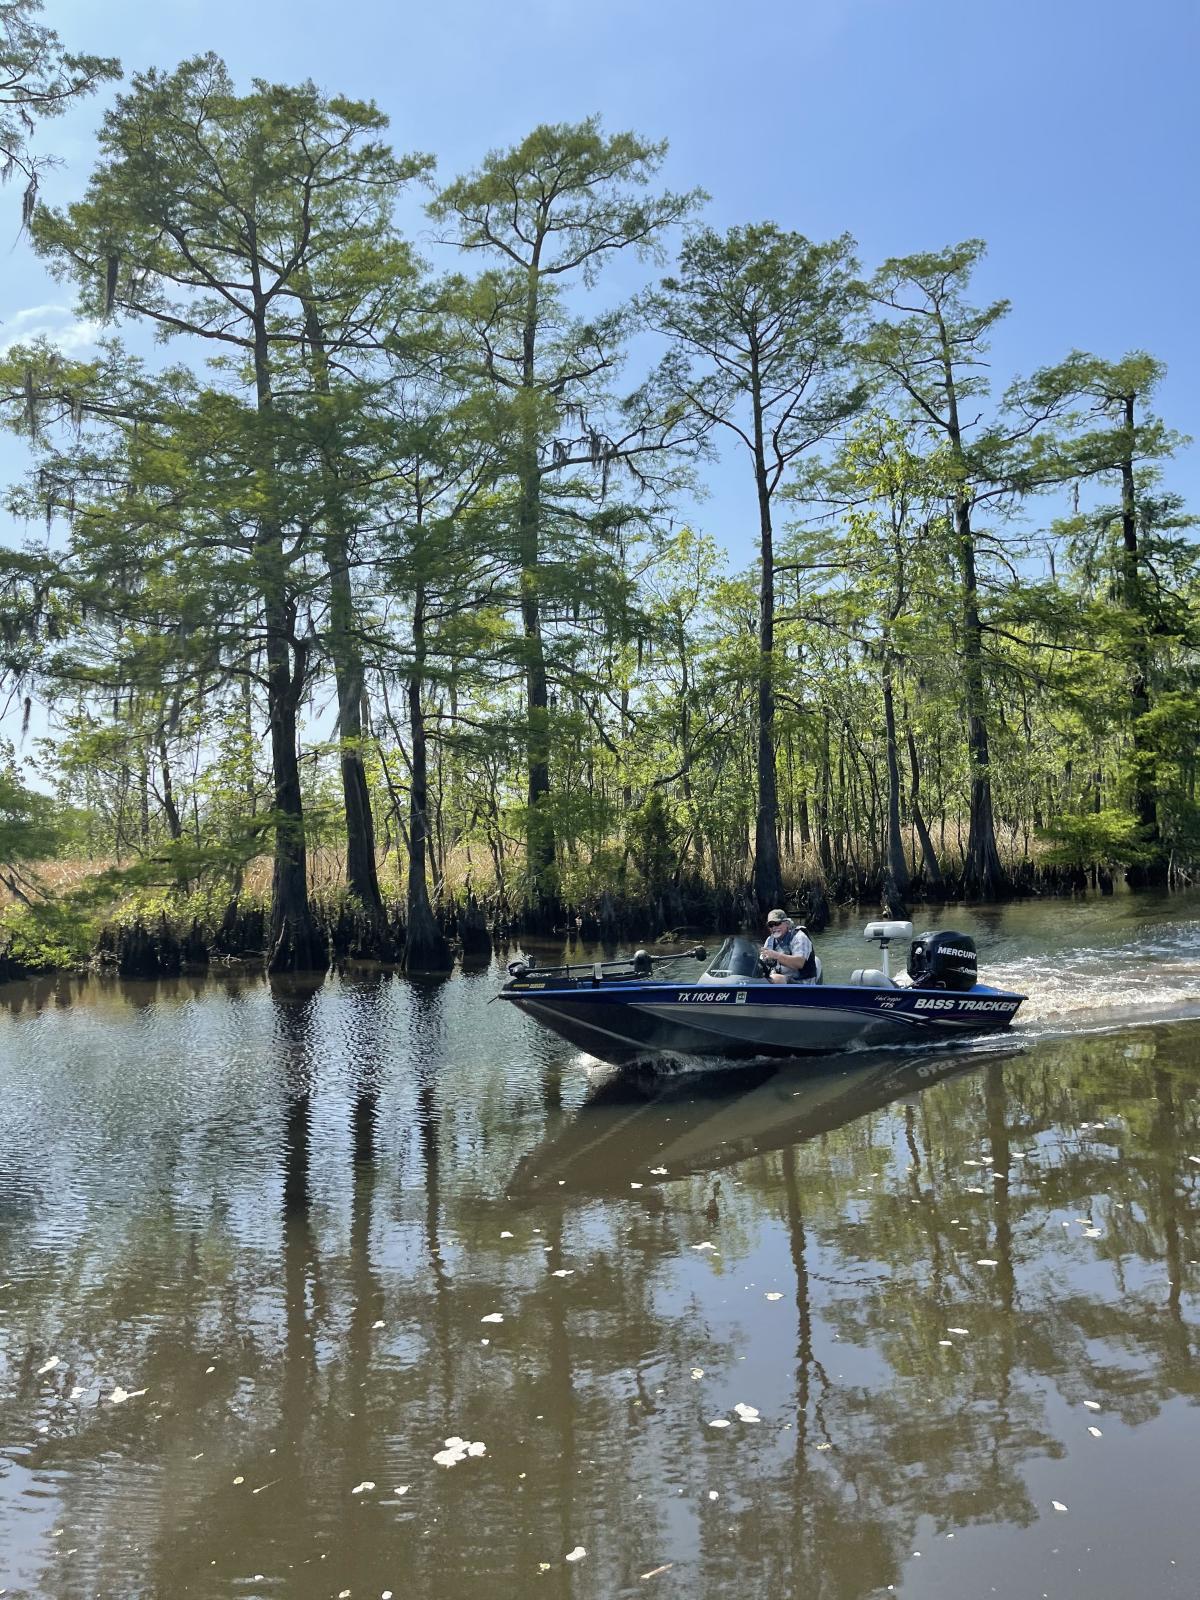 Man on speedboat in swamp in Beaumont, TX